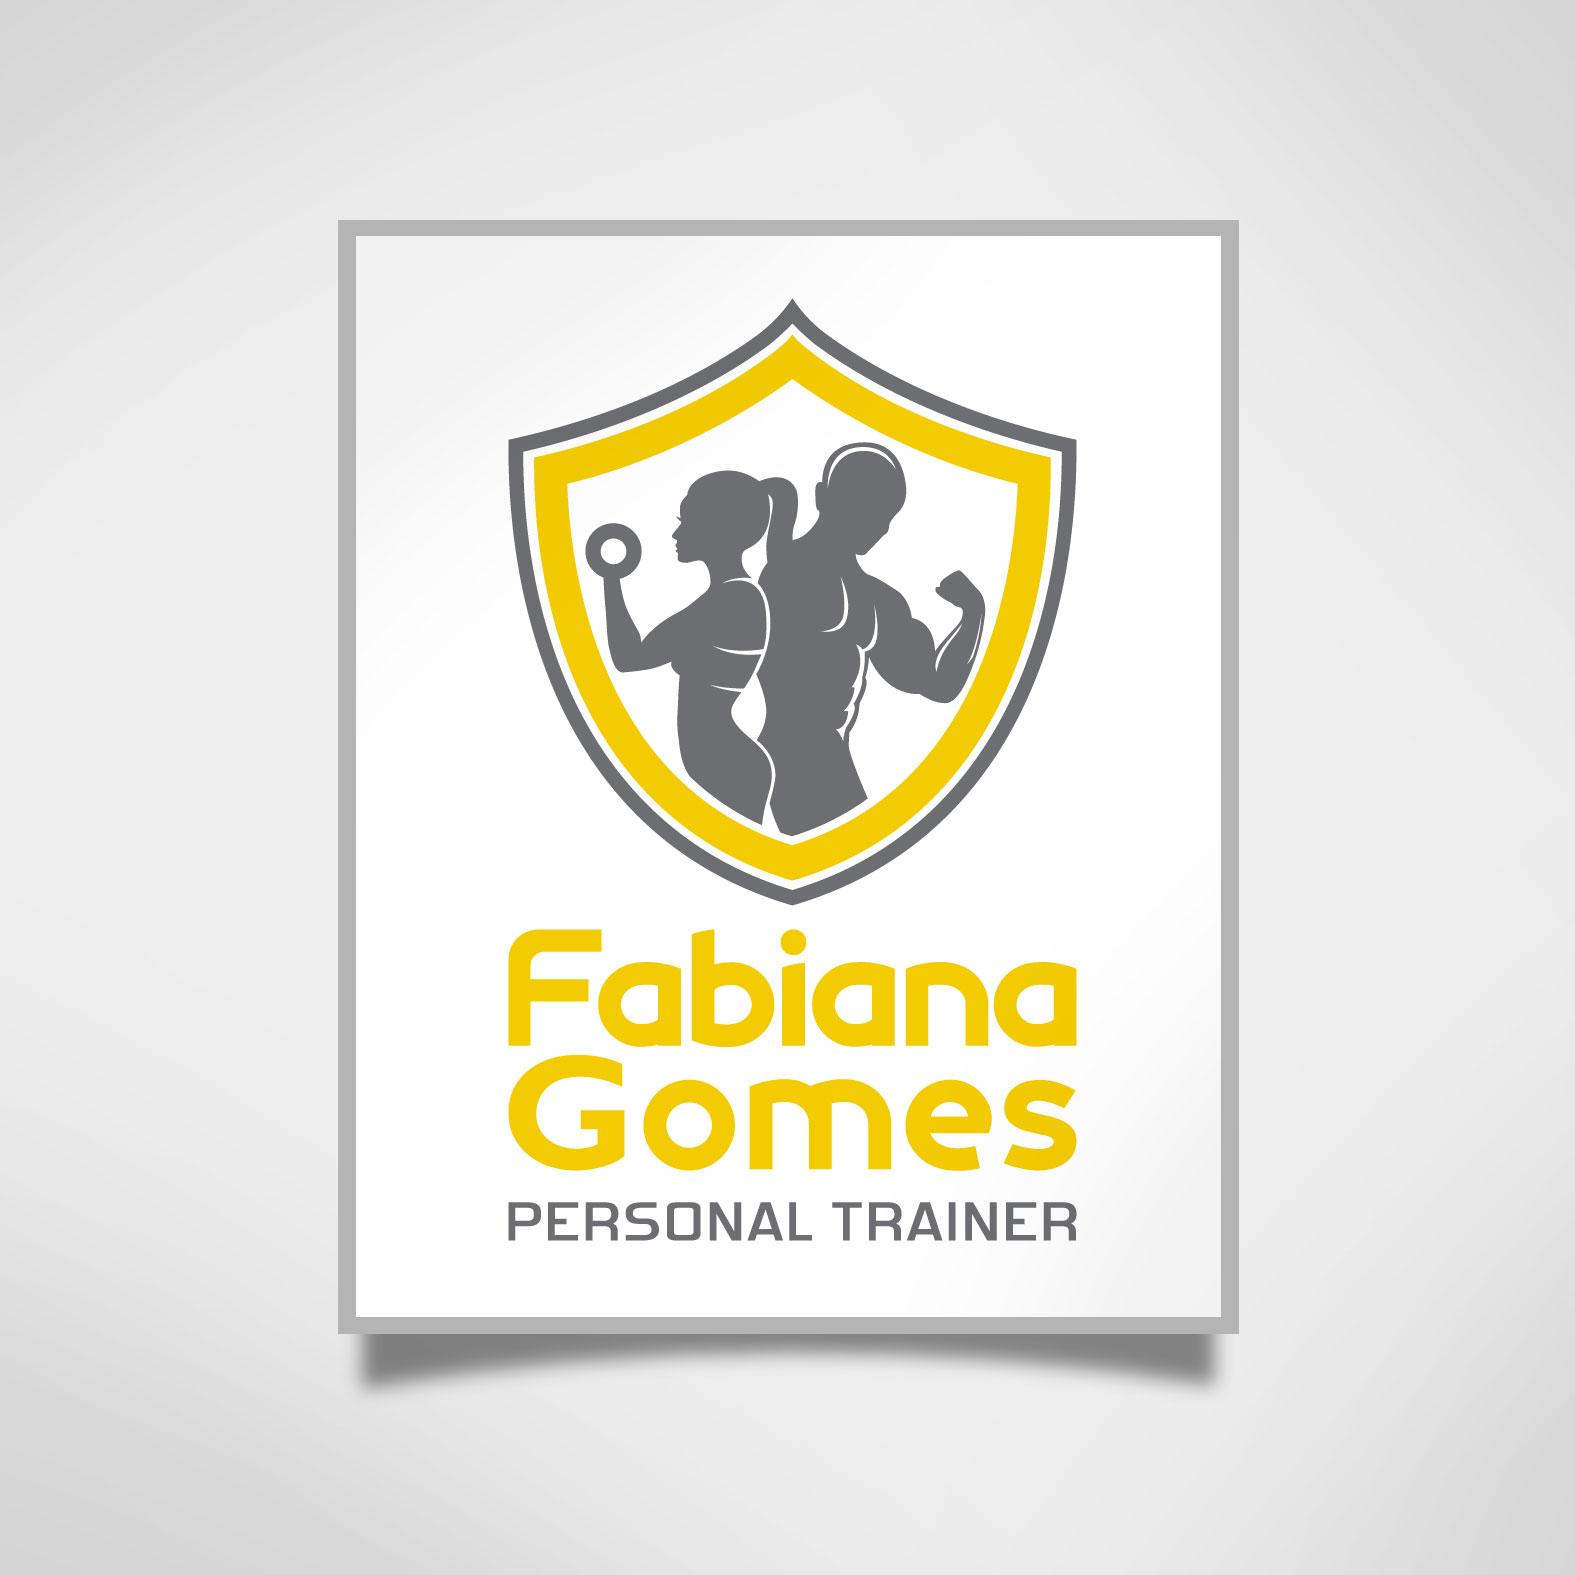 Marca Fabiana Gomes Personal